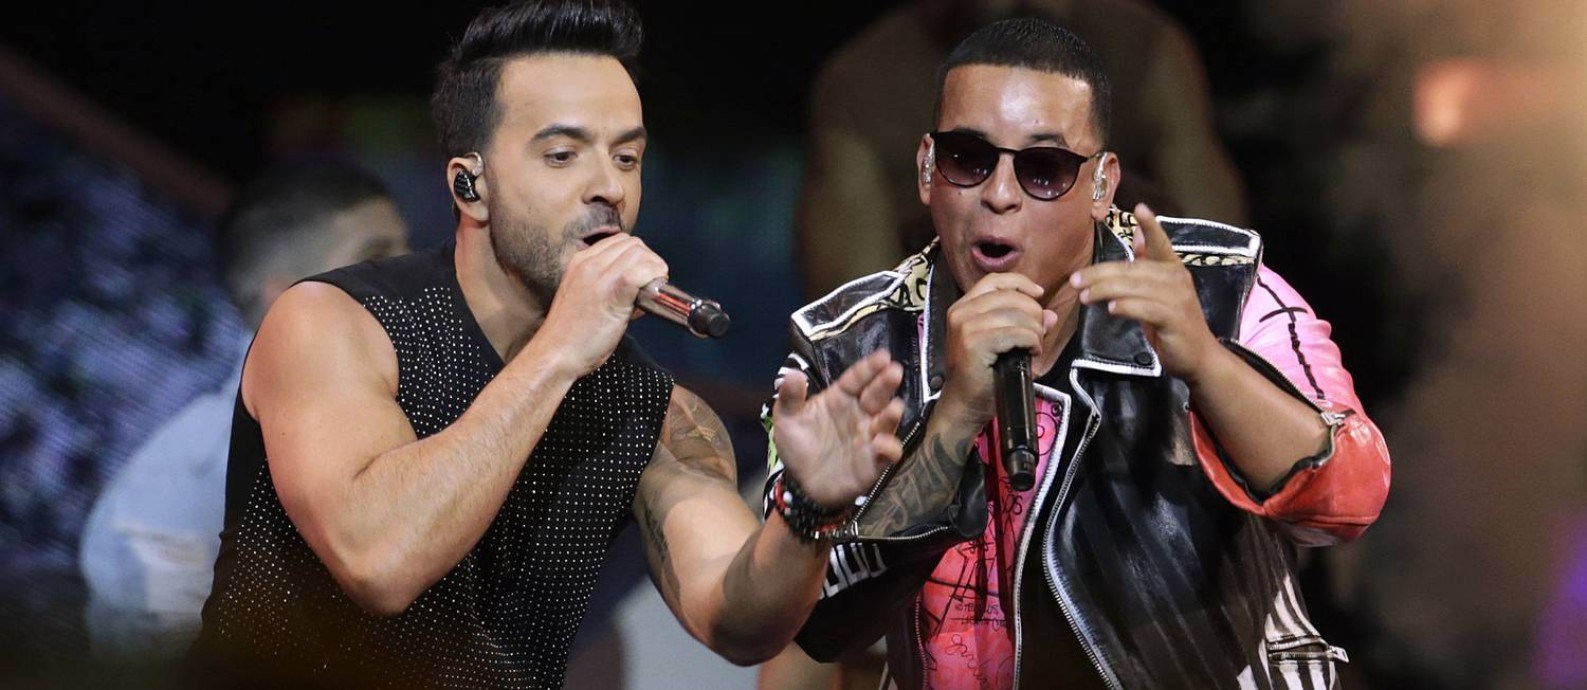 Luis Fonsi (à esq.) e Daddy Yankee cantam em Coral Gables, na Flórida Foto: Lynne Sladky / AP